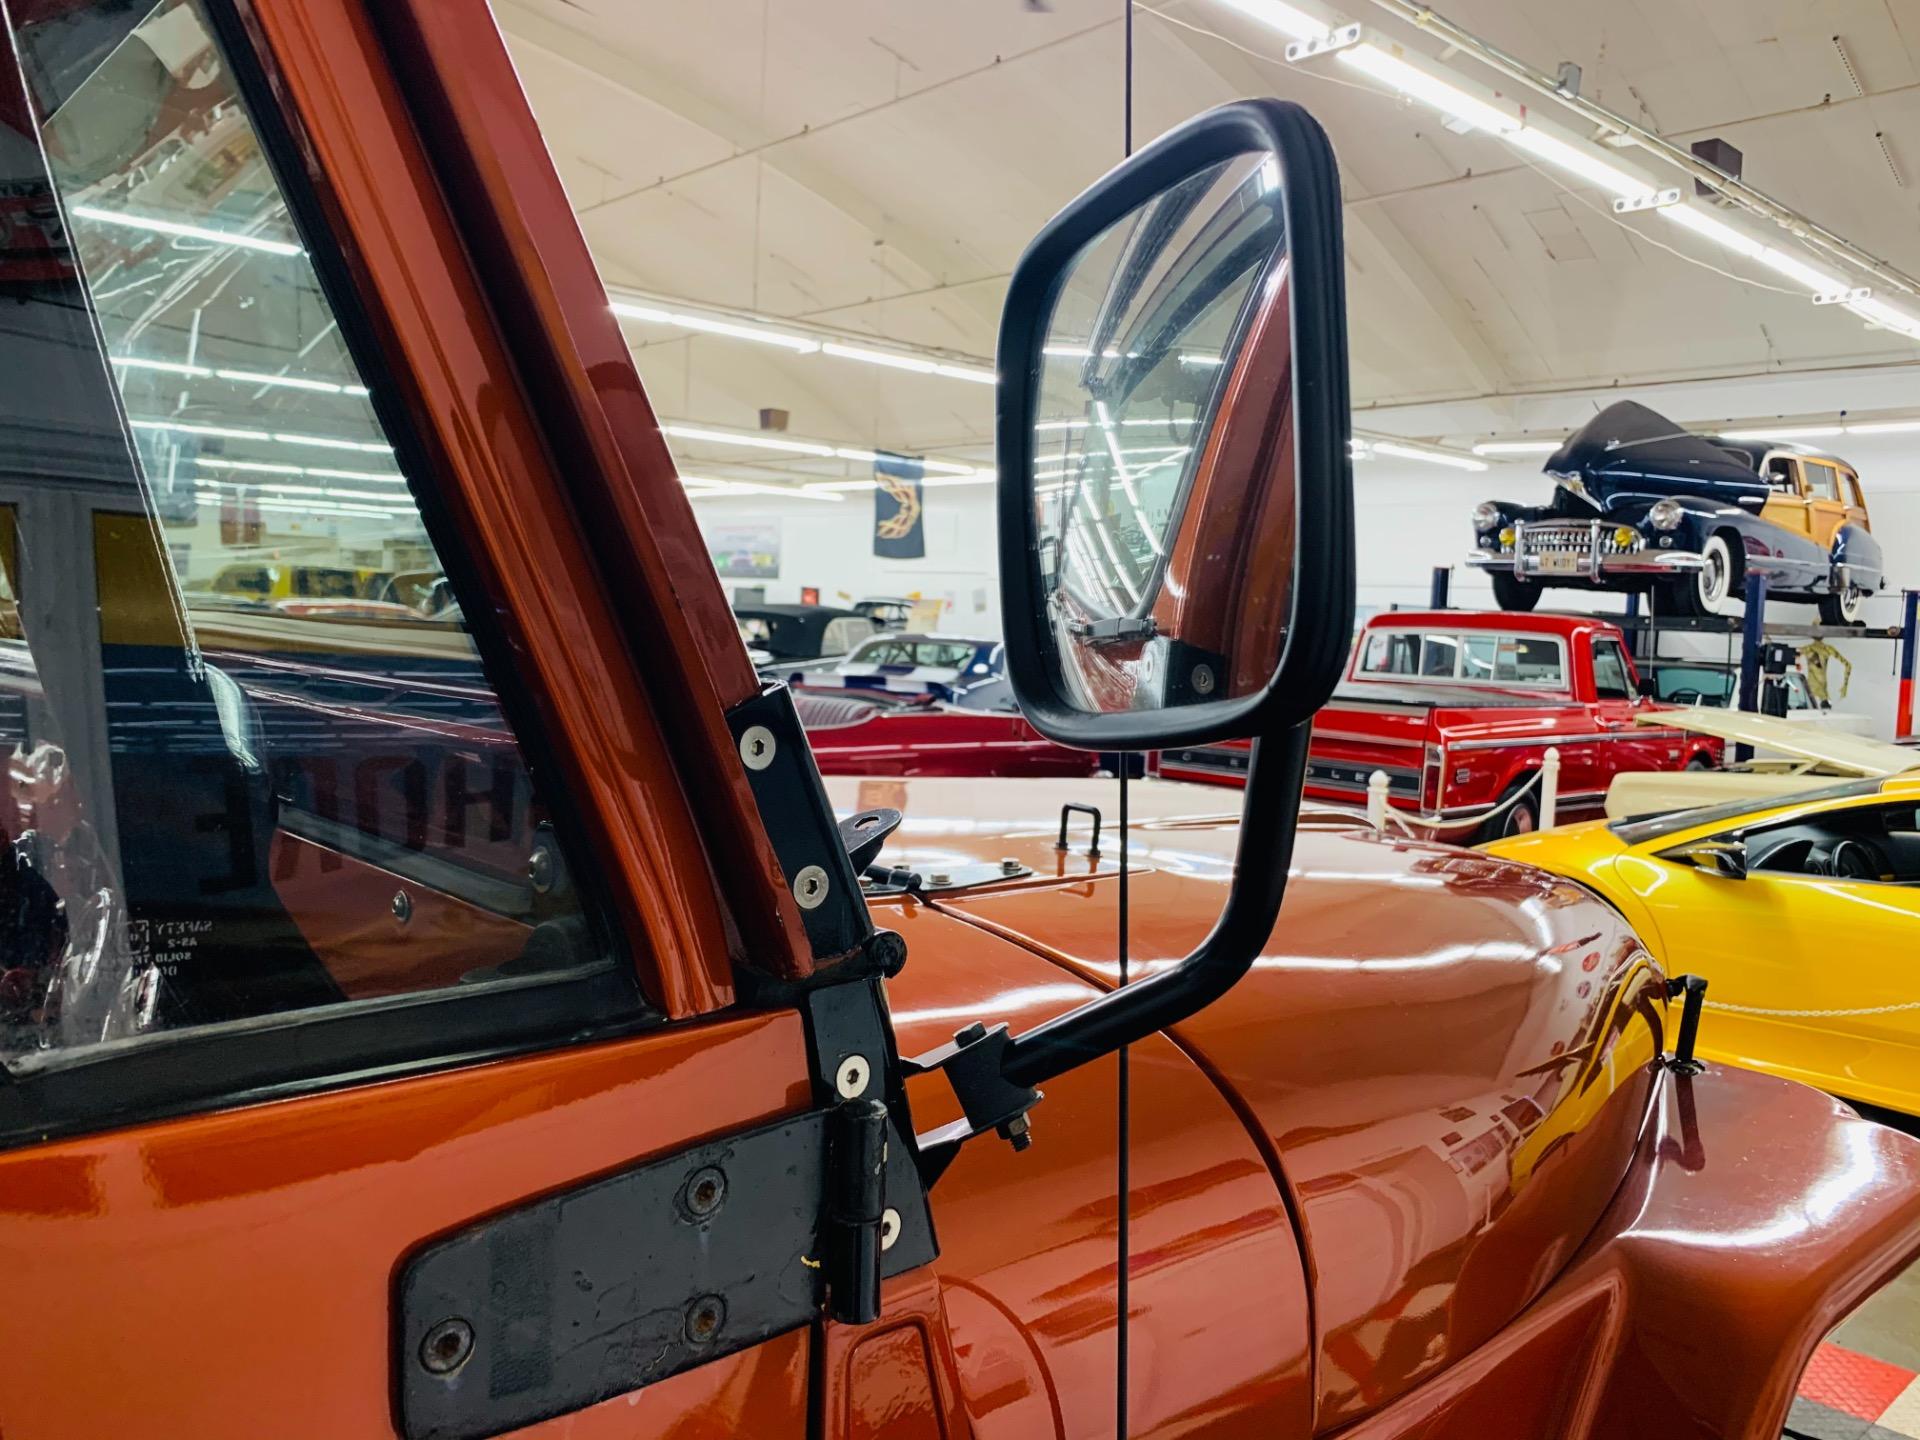 Used 1986 Jeep CJ-7 - CUSTOM BUILD - 4.3L VORTEC SWAP - SEE VIDEO - | Mundelein, IL